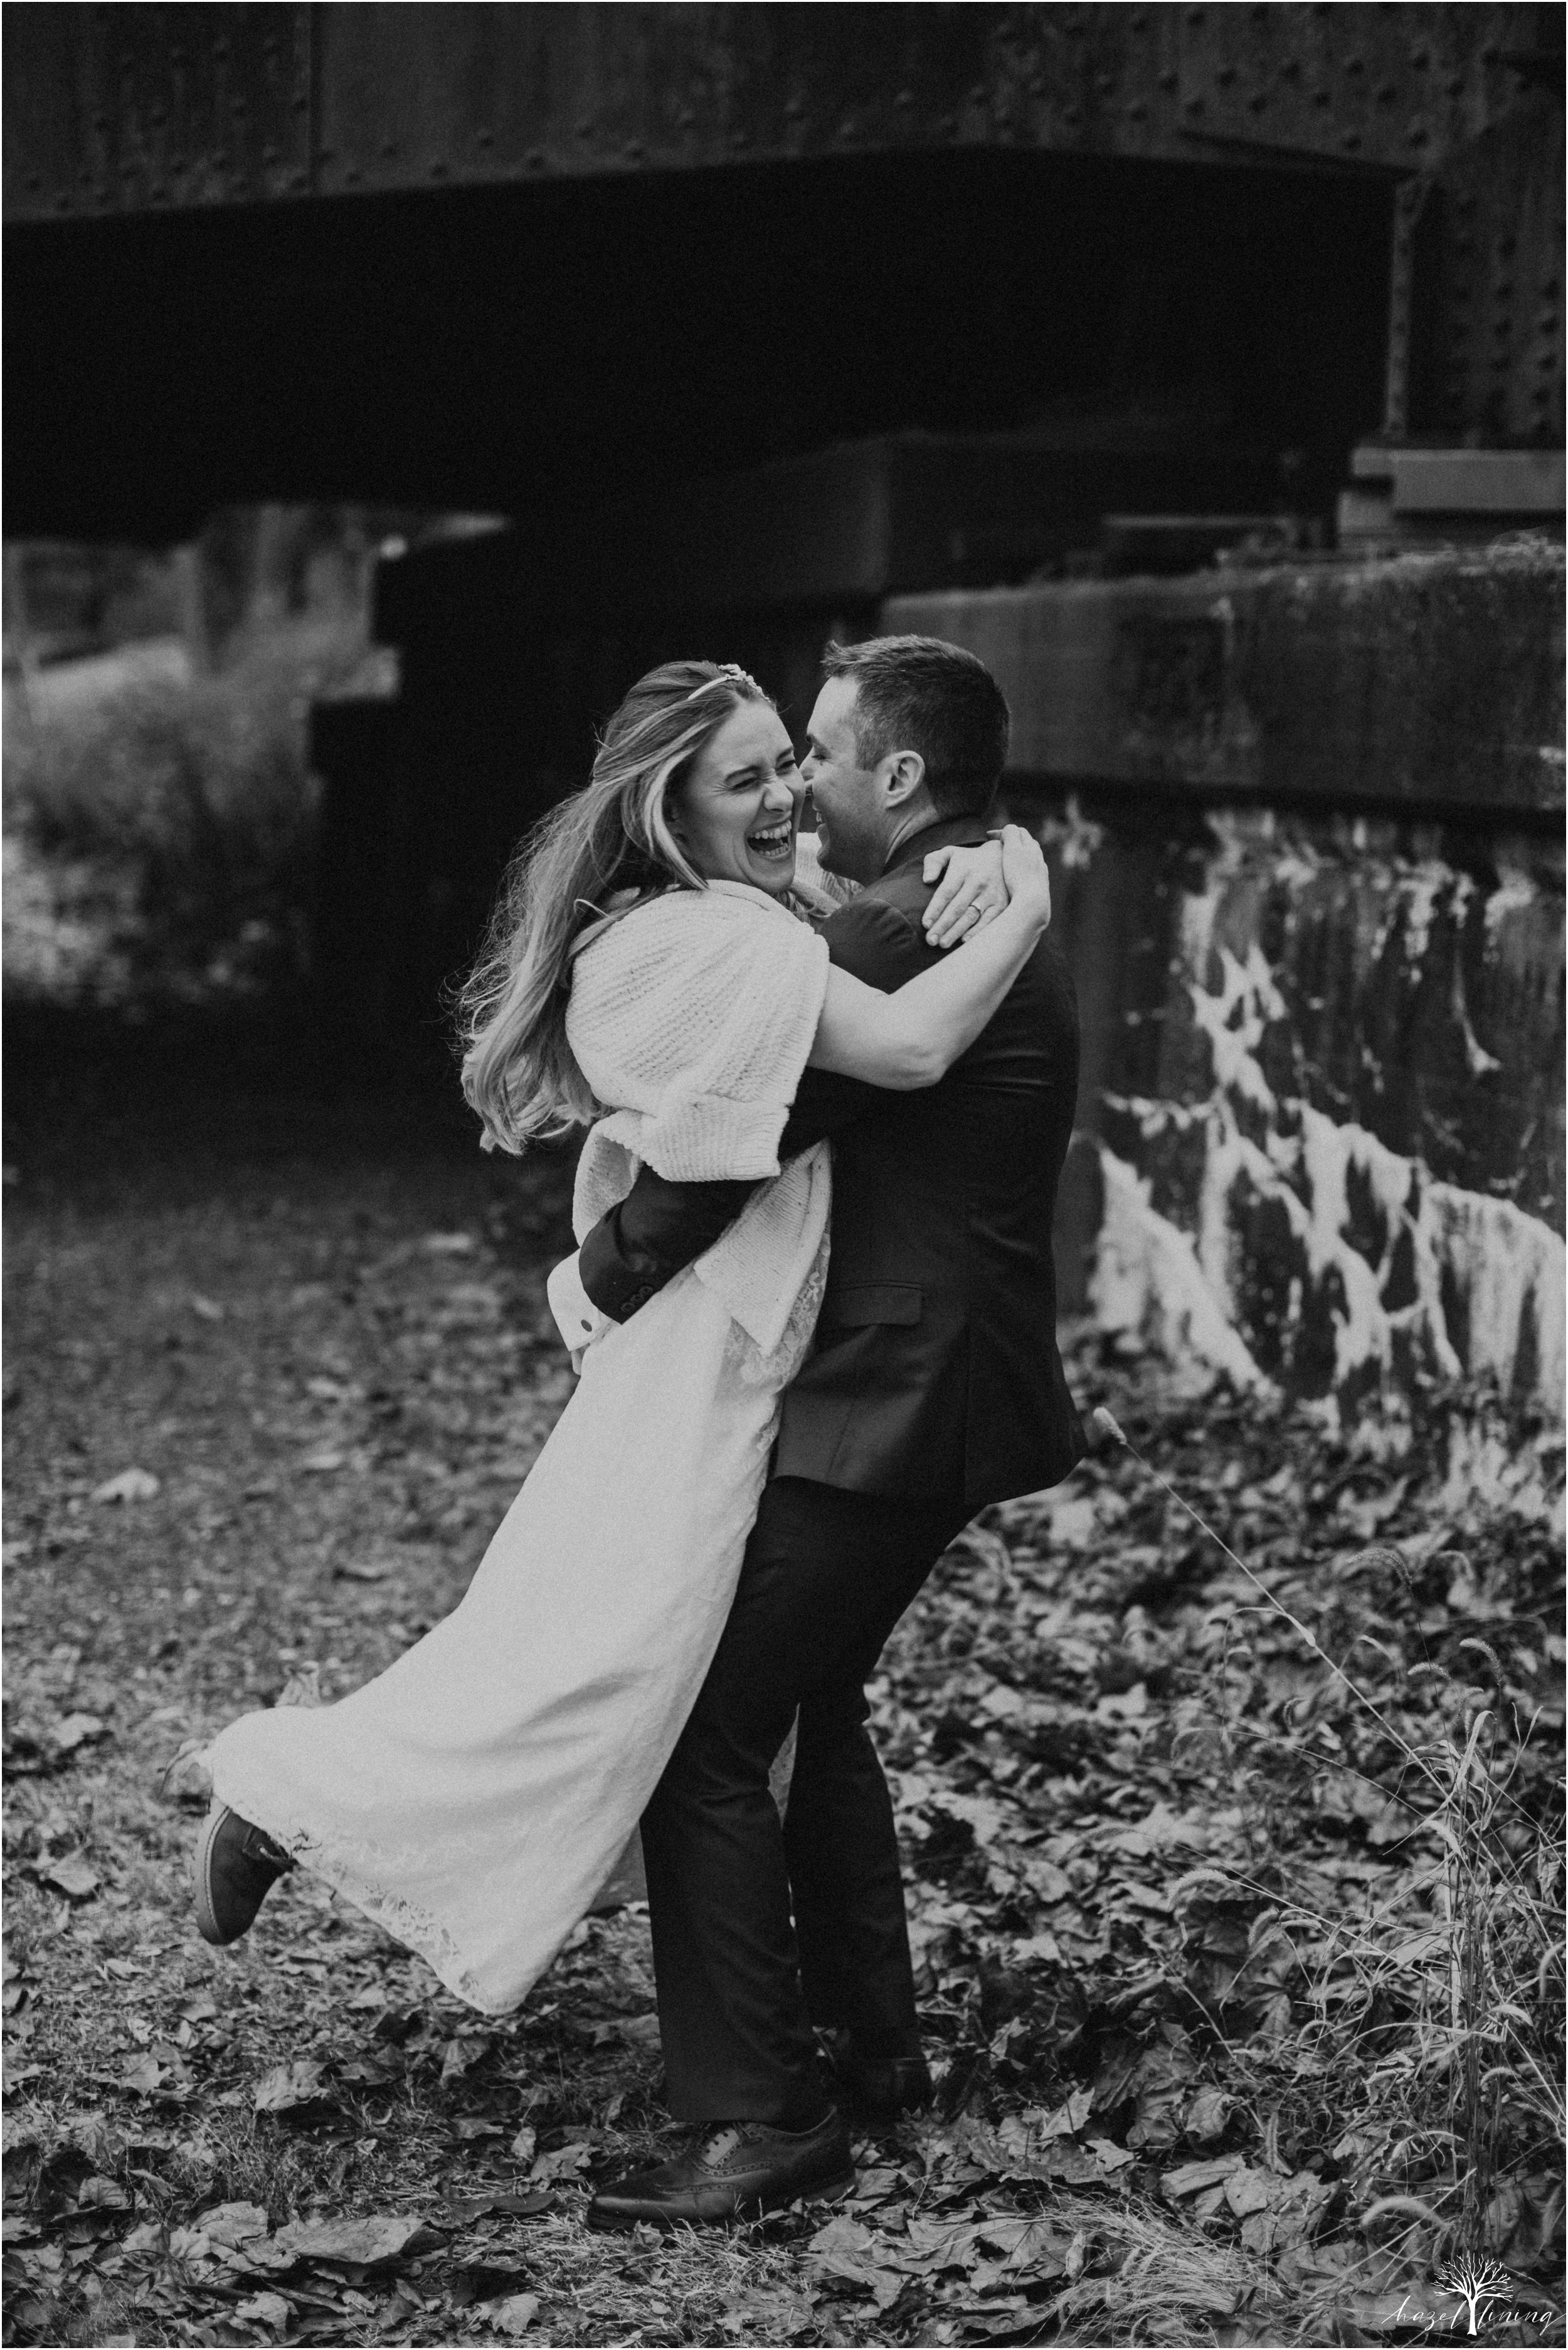 emily-pulham-paul-vincent-london-to-allentown-pa-railway-wedding-portraits_0026.jpg